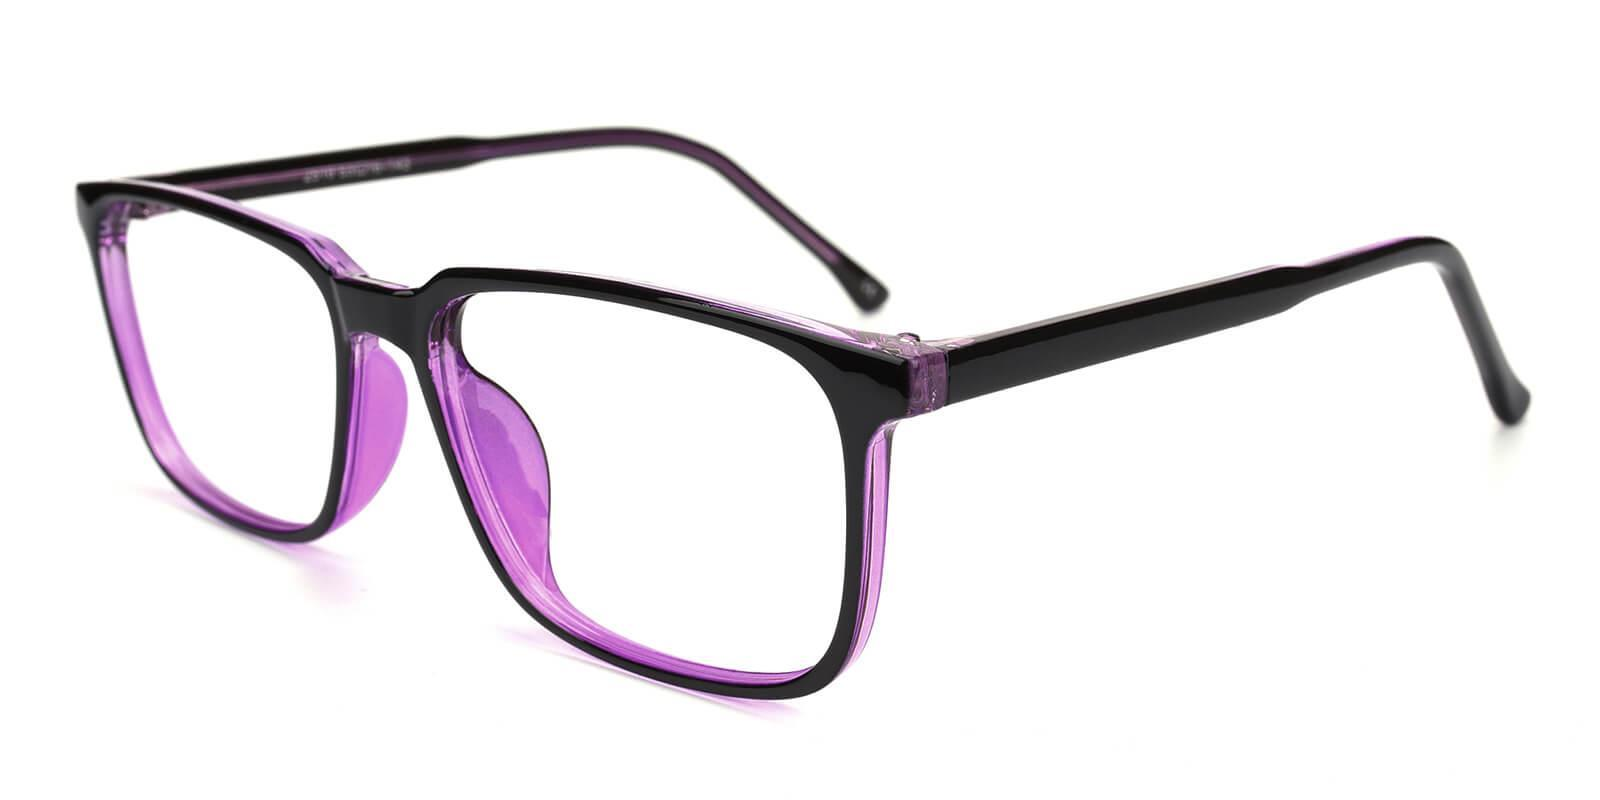 Belleville Purple Acetate Eyeglasses , UniversalBridgeFit Frames from ABBE Glasses